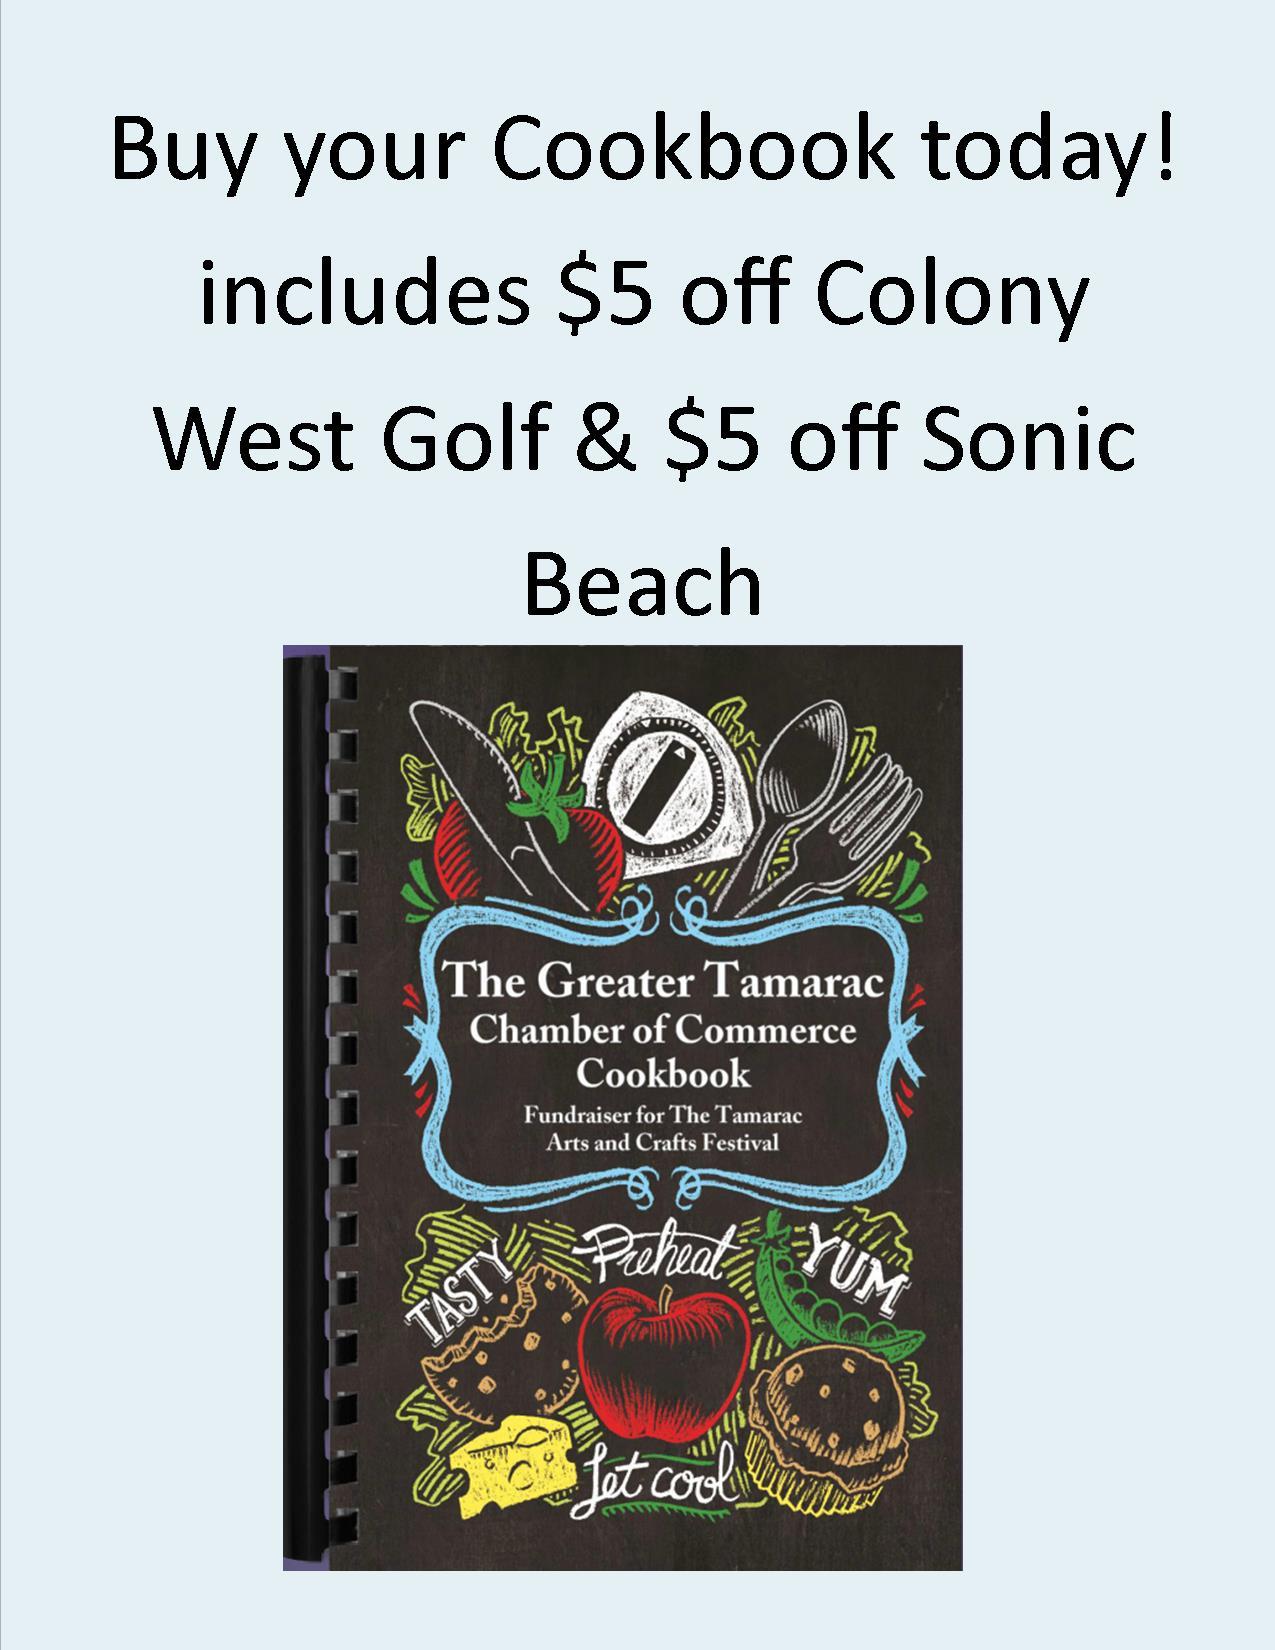 cookbook promotion